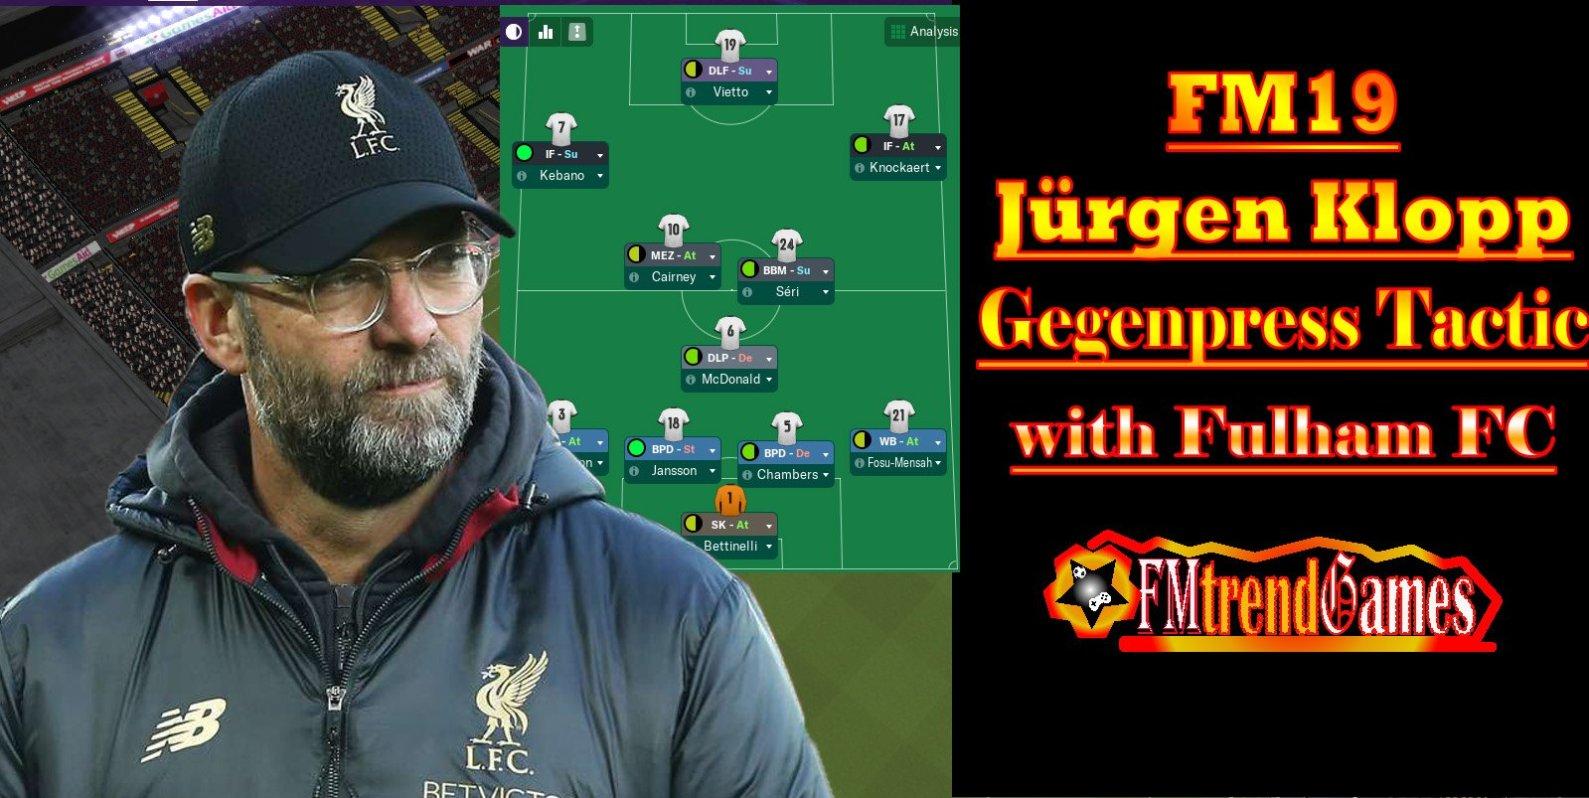 Best of FM19 Gegenpress Tactic: Jürgen Klopp's 4-3-3 Formation with